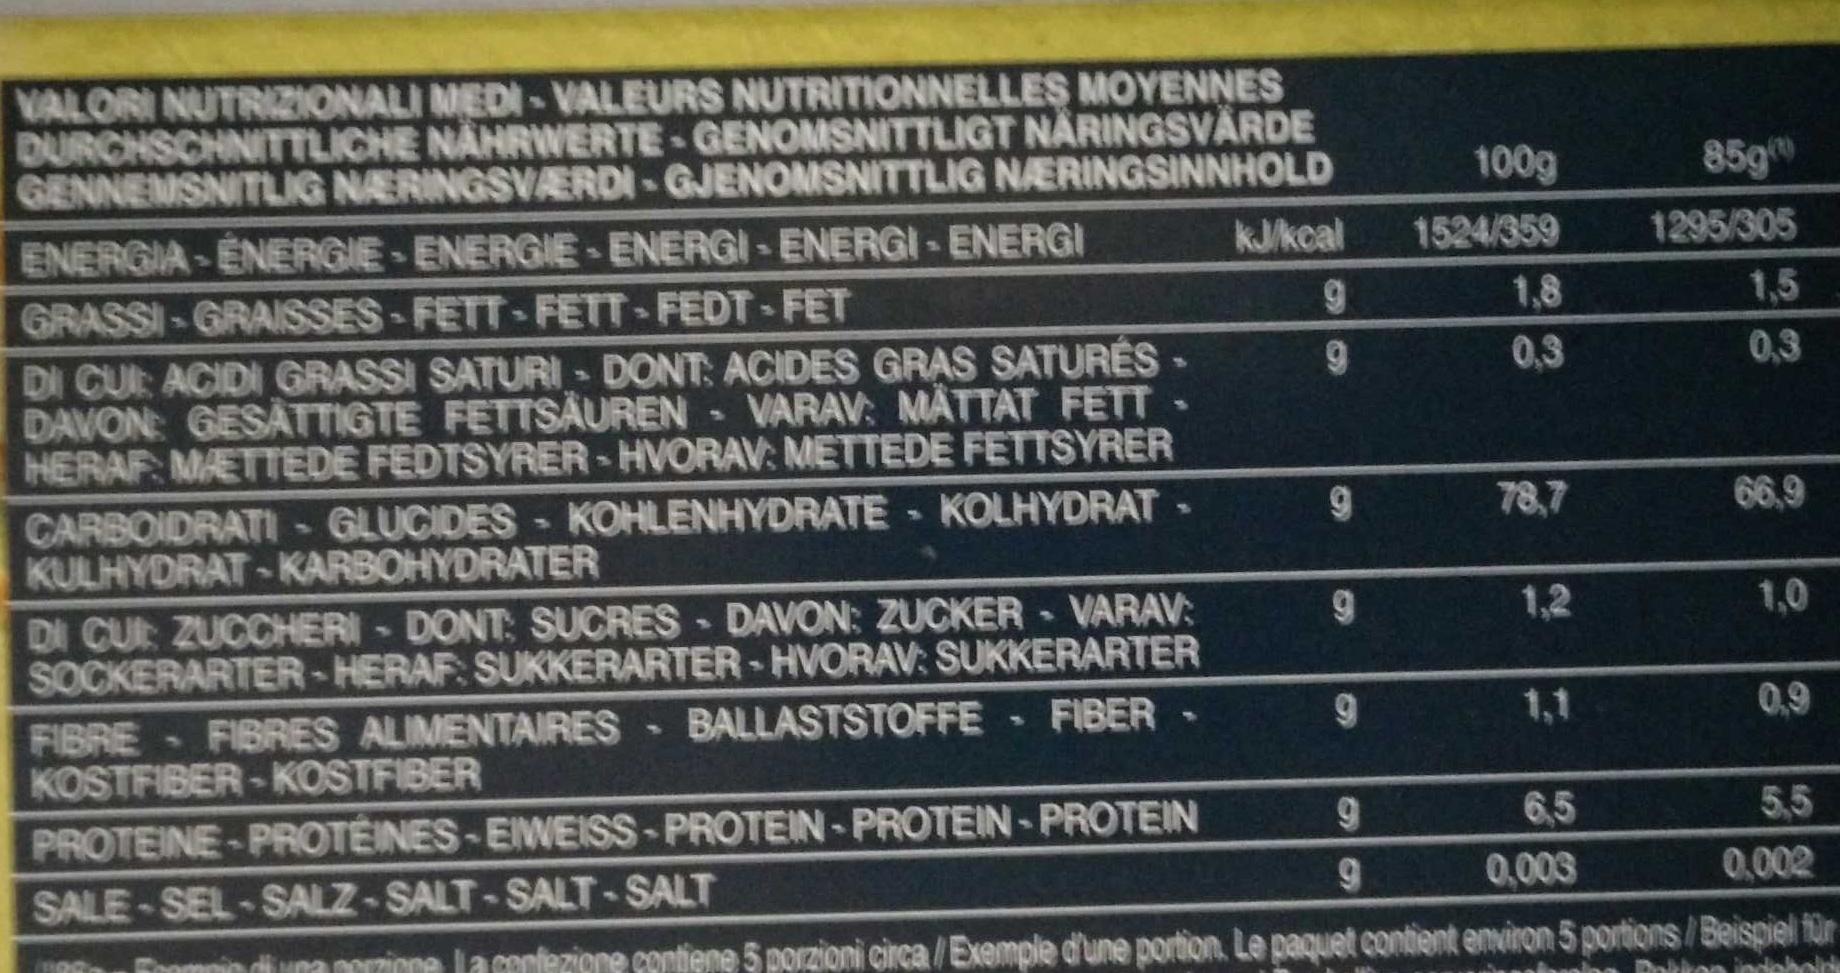 Senza Glutine Spaghetti n°5 - Informazioni nutrizionali